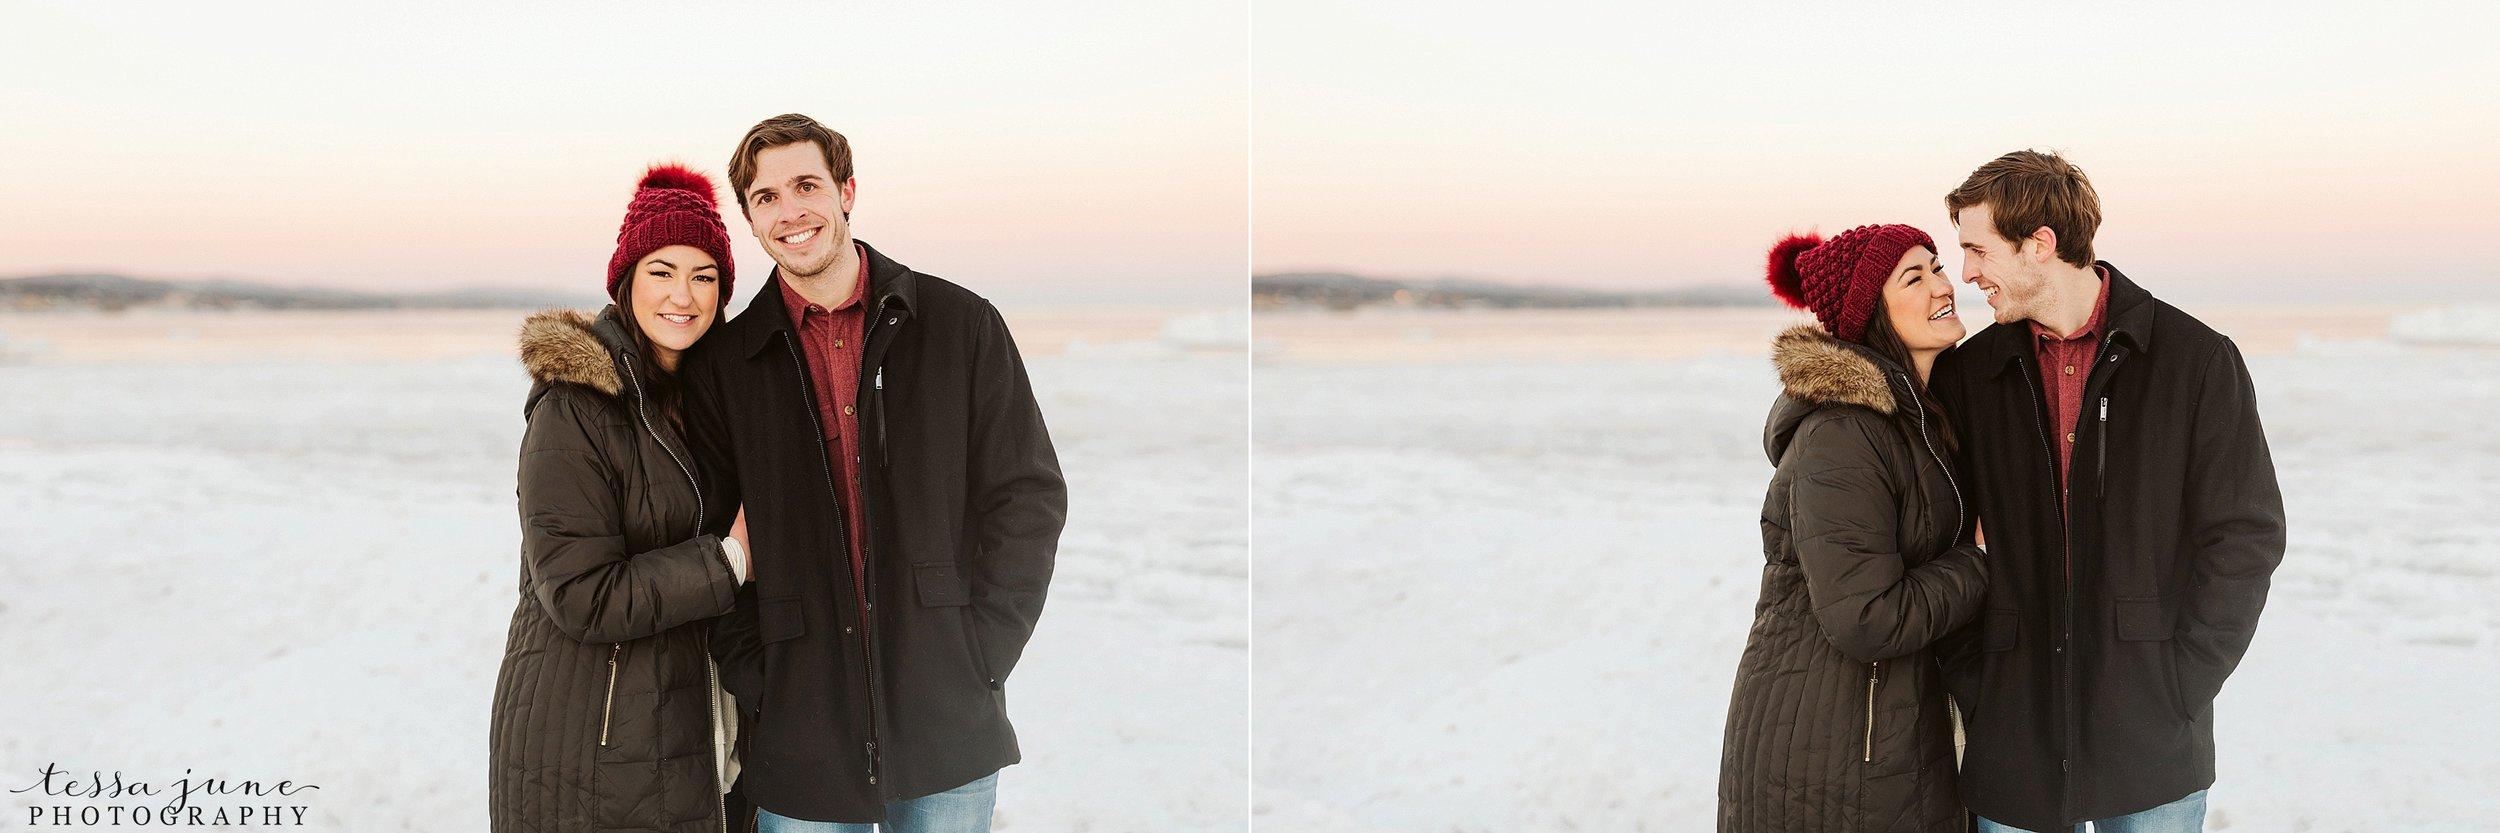 winter-duluth-engagement-at-park-pointe-snow-aly-alex-57.jpg